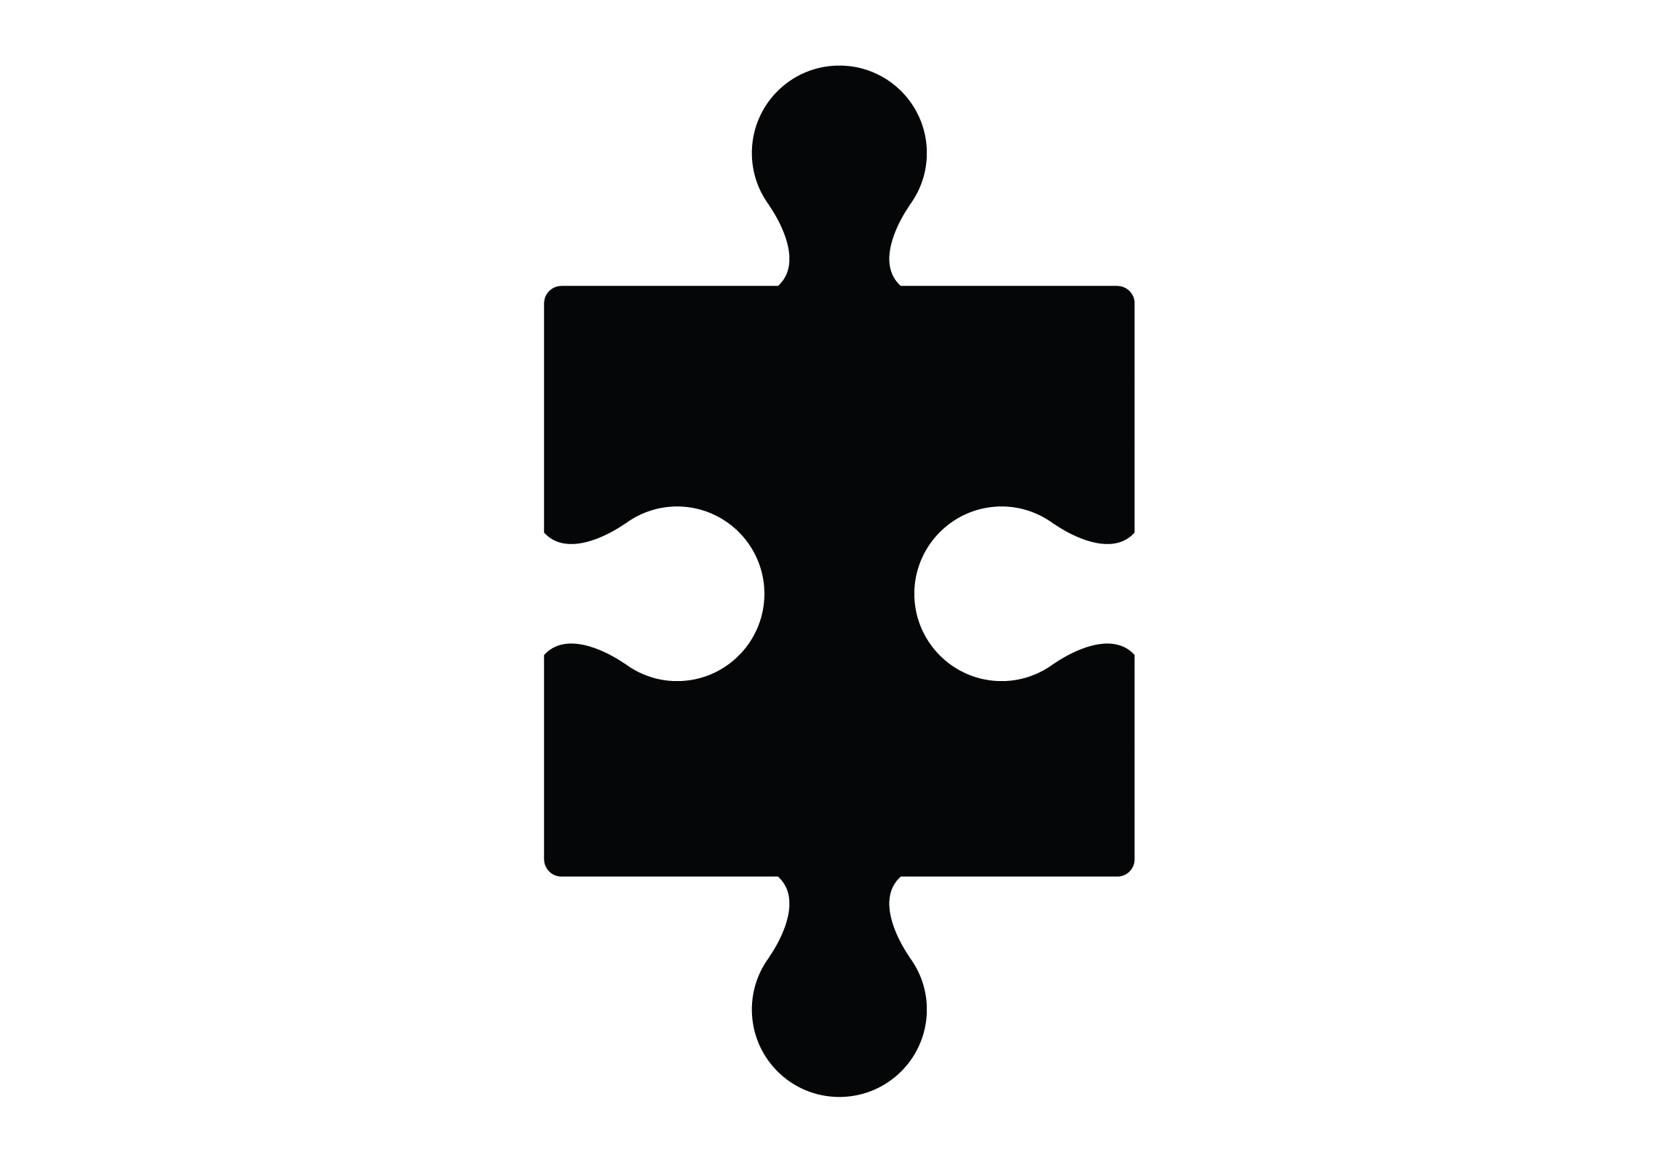 puzzle_piece4_RECT.jpg